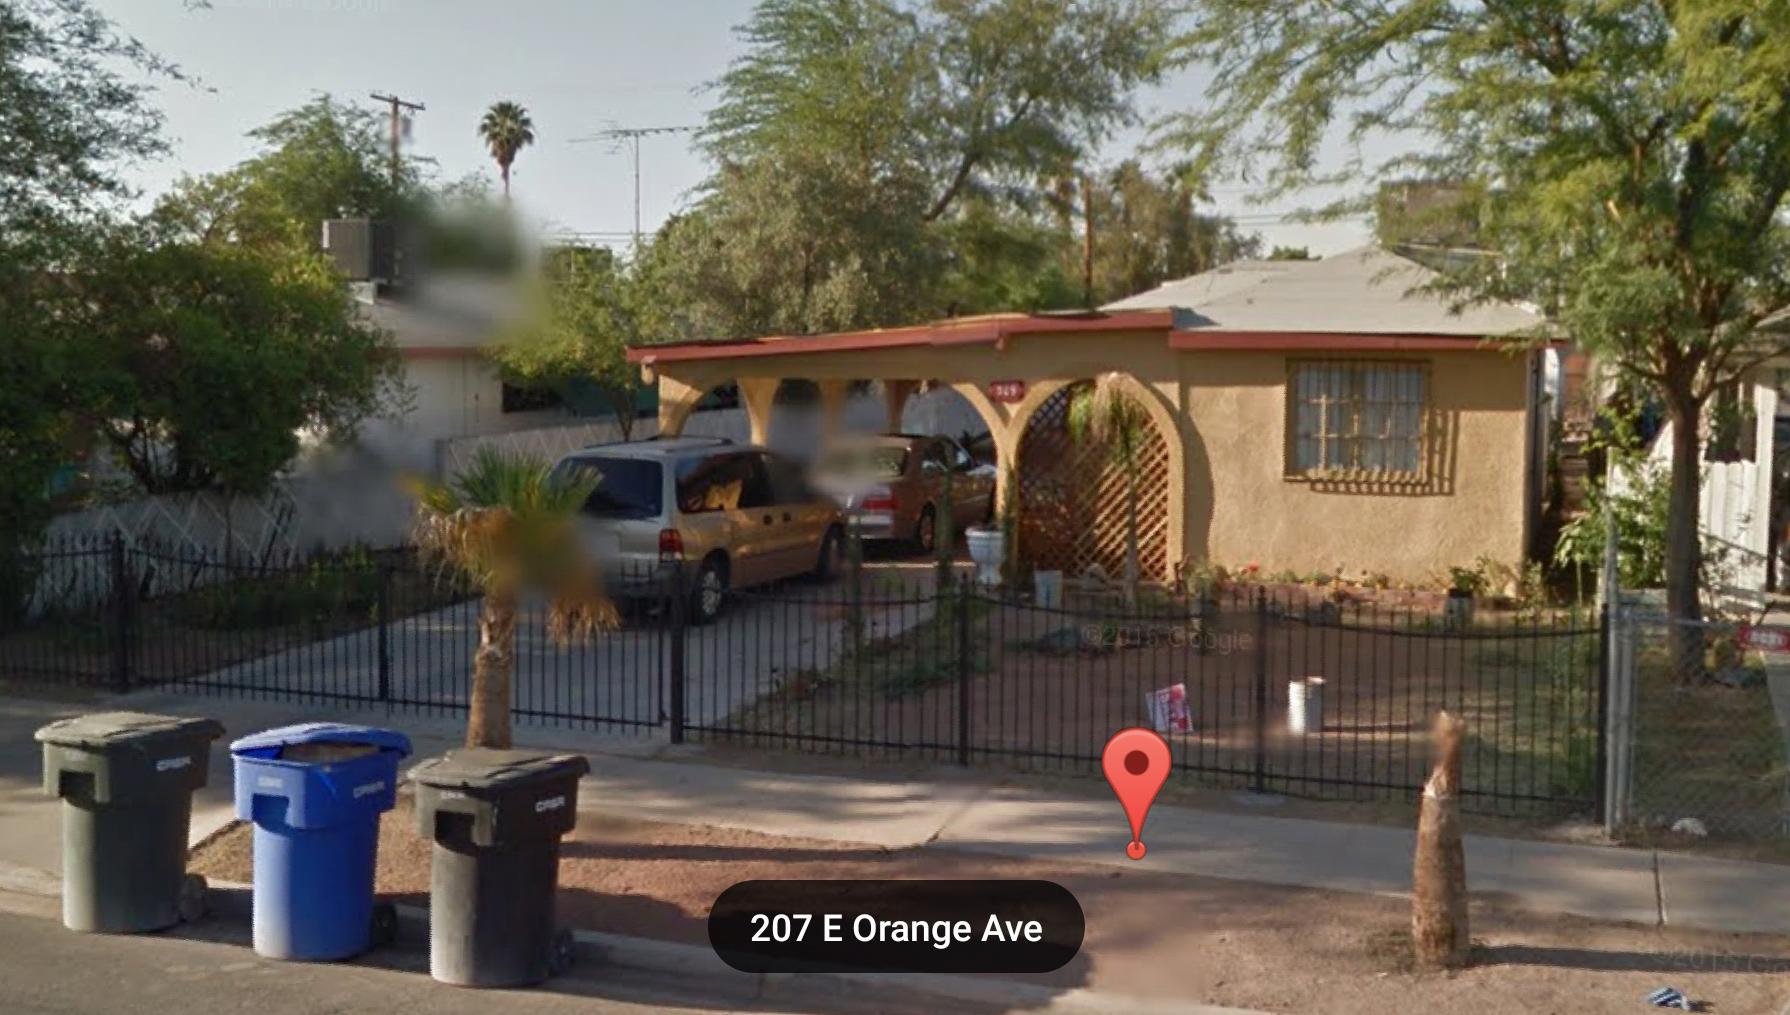 Big yard, Small home in Southern California (El Centro)